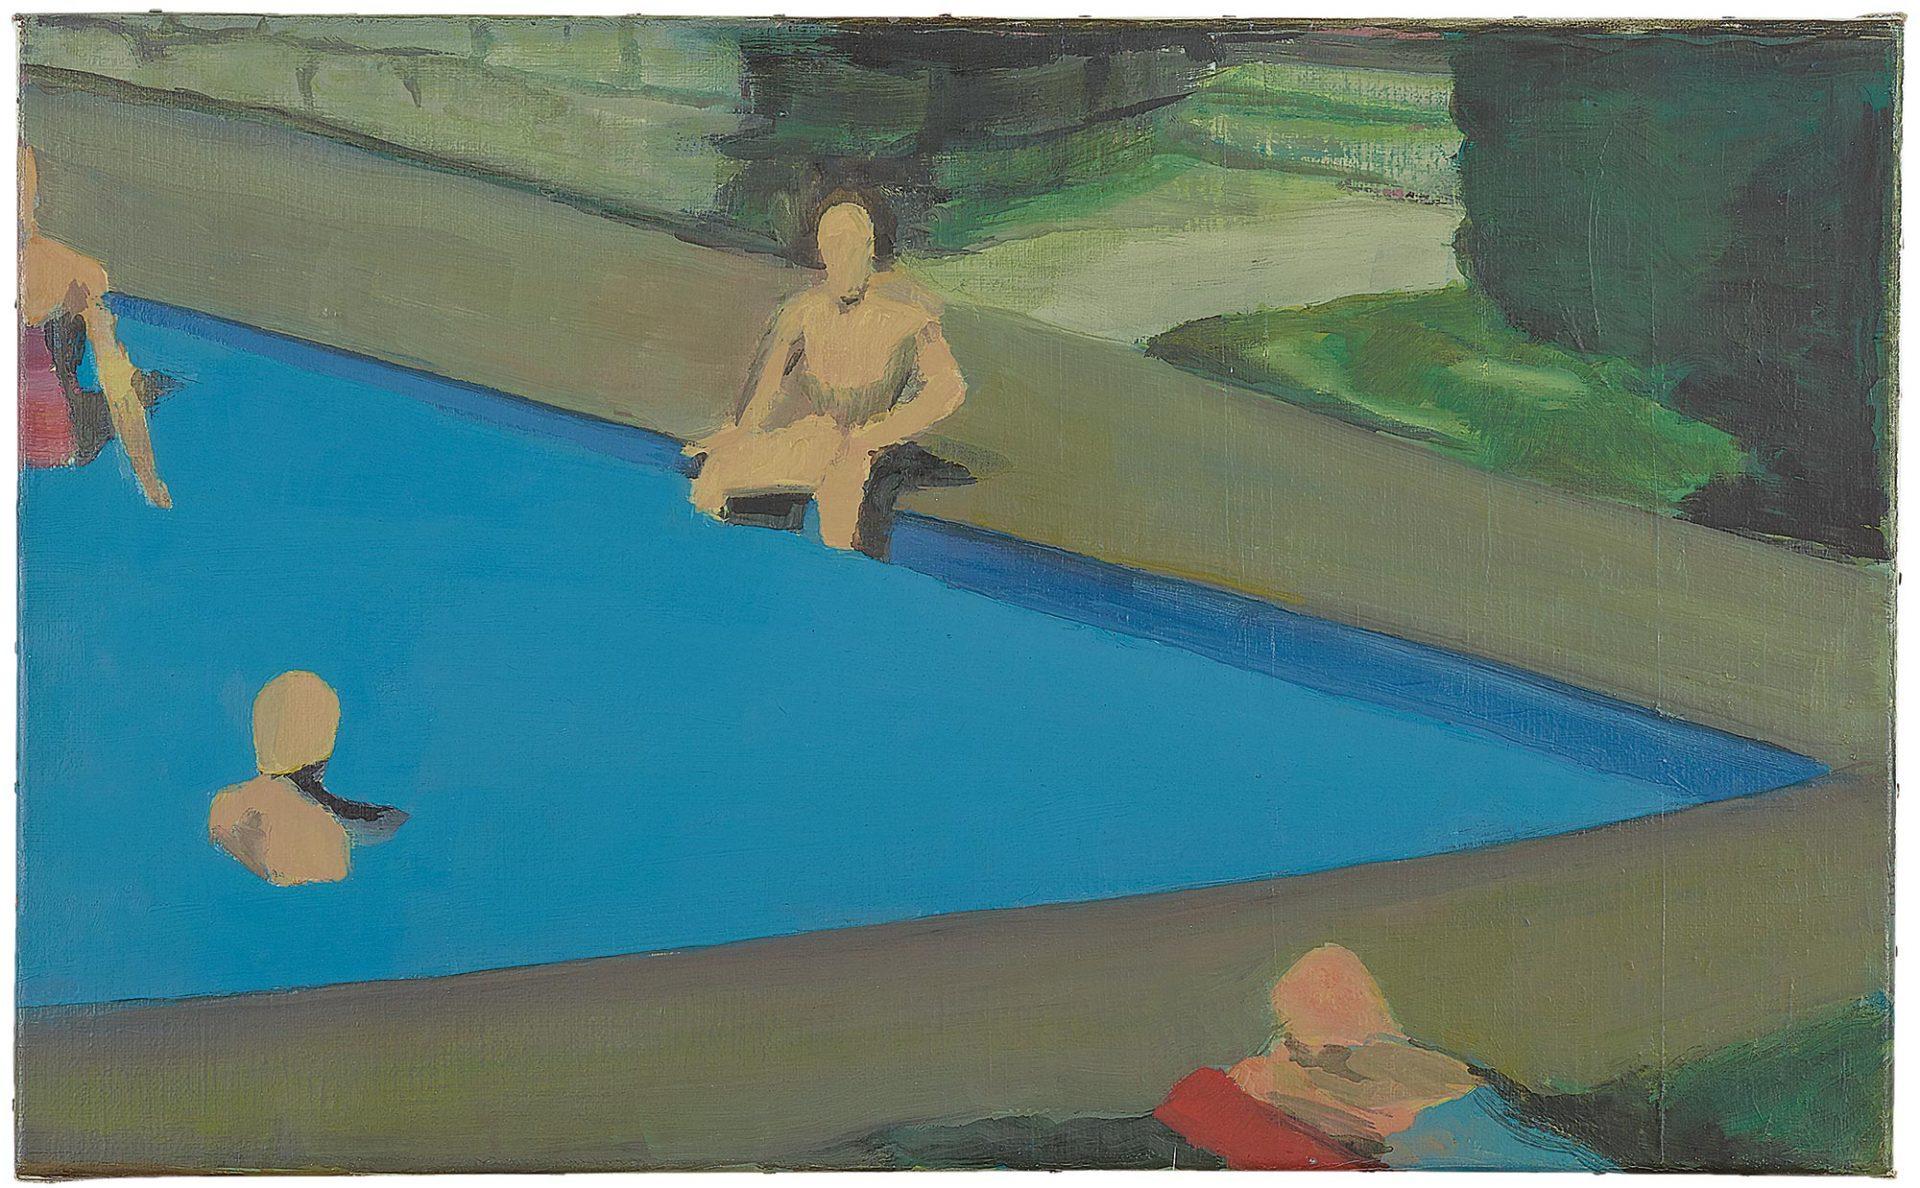 The Swimming Pool, 1990 - (c)Studio Luc Tuymans